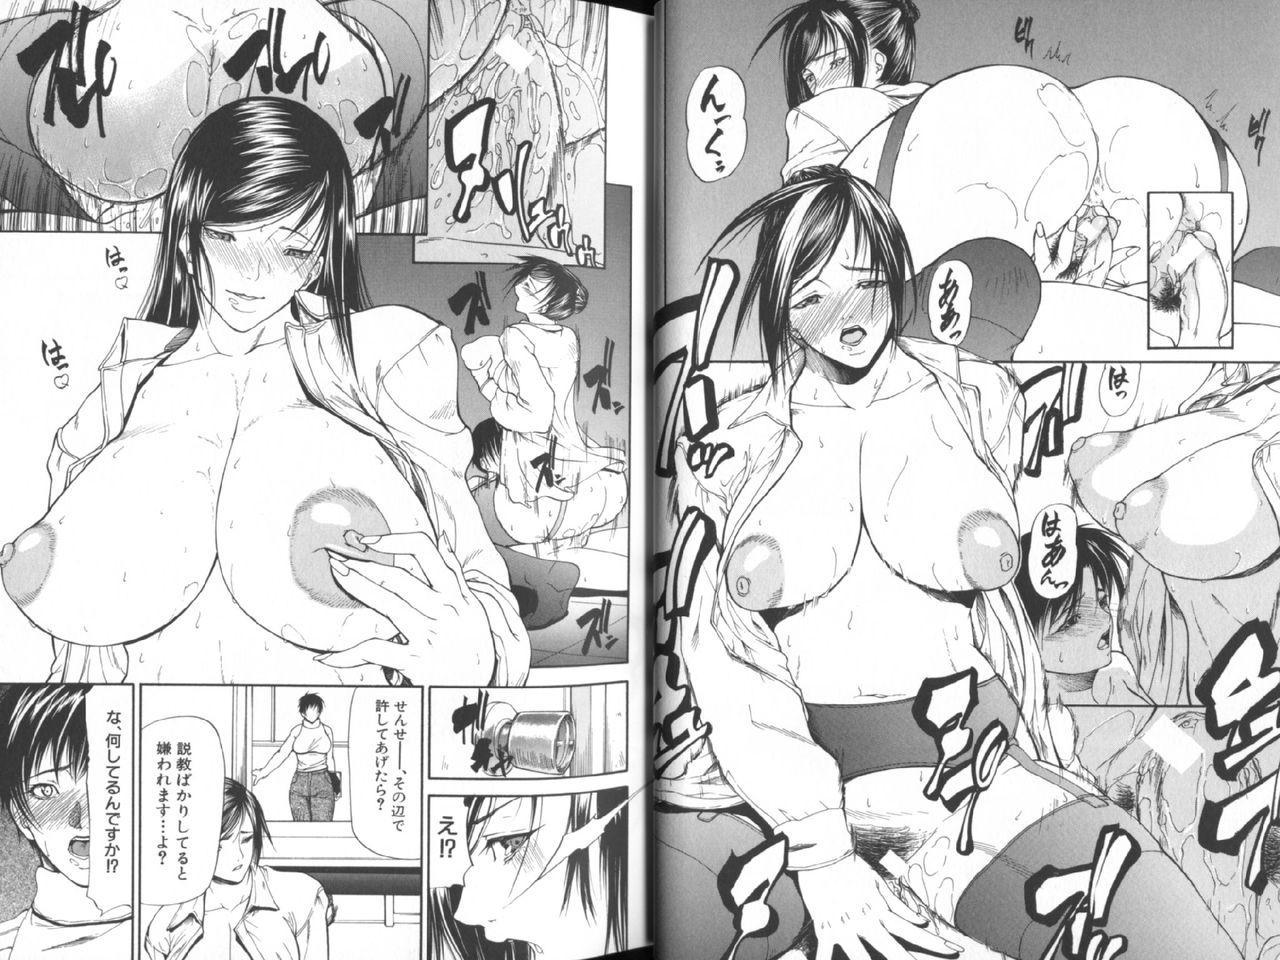 Senjou - A Desire is Instigated 17